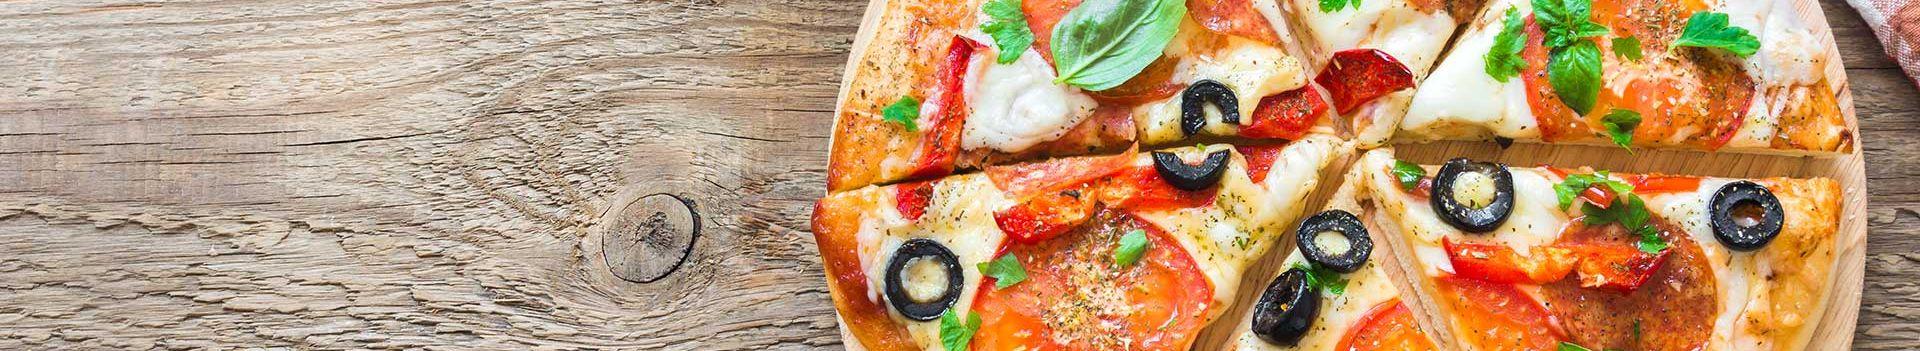 Pizzeria Dolce Vita 1 Lieferservice in Wien